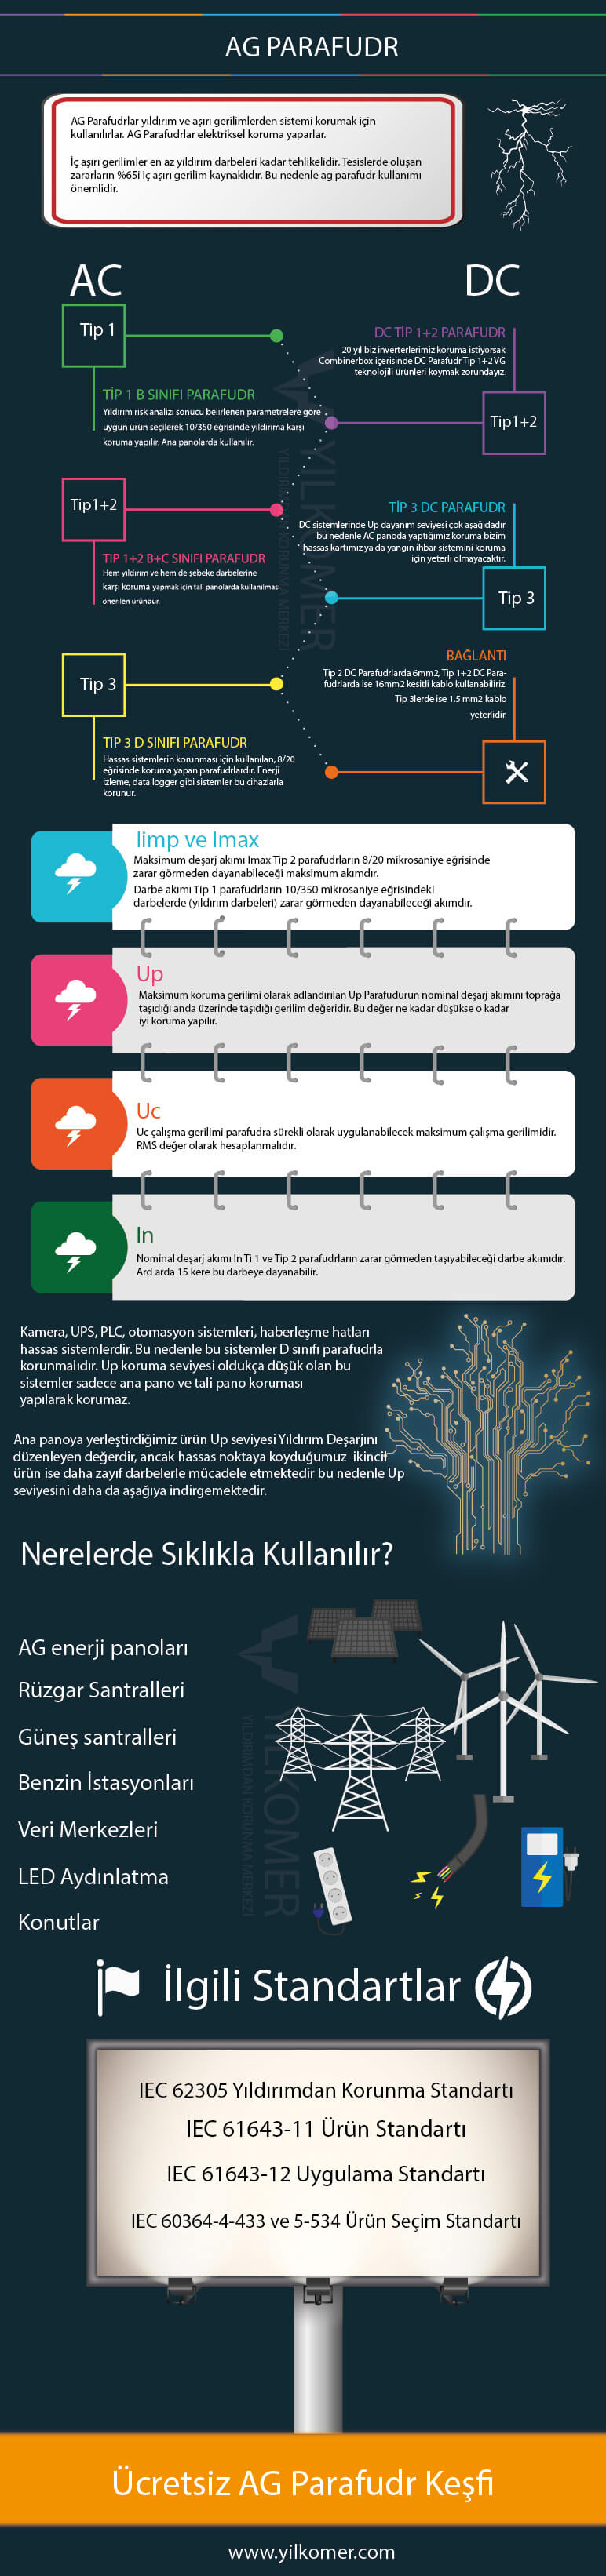 infografik-parafudr-01